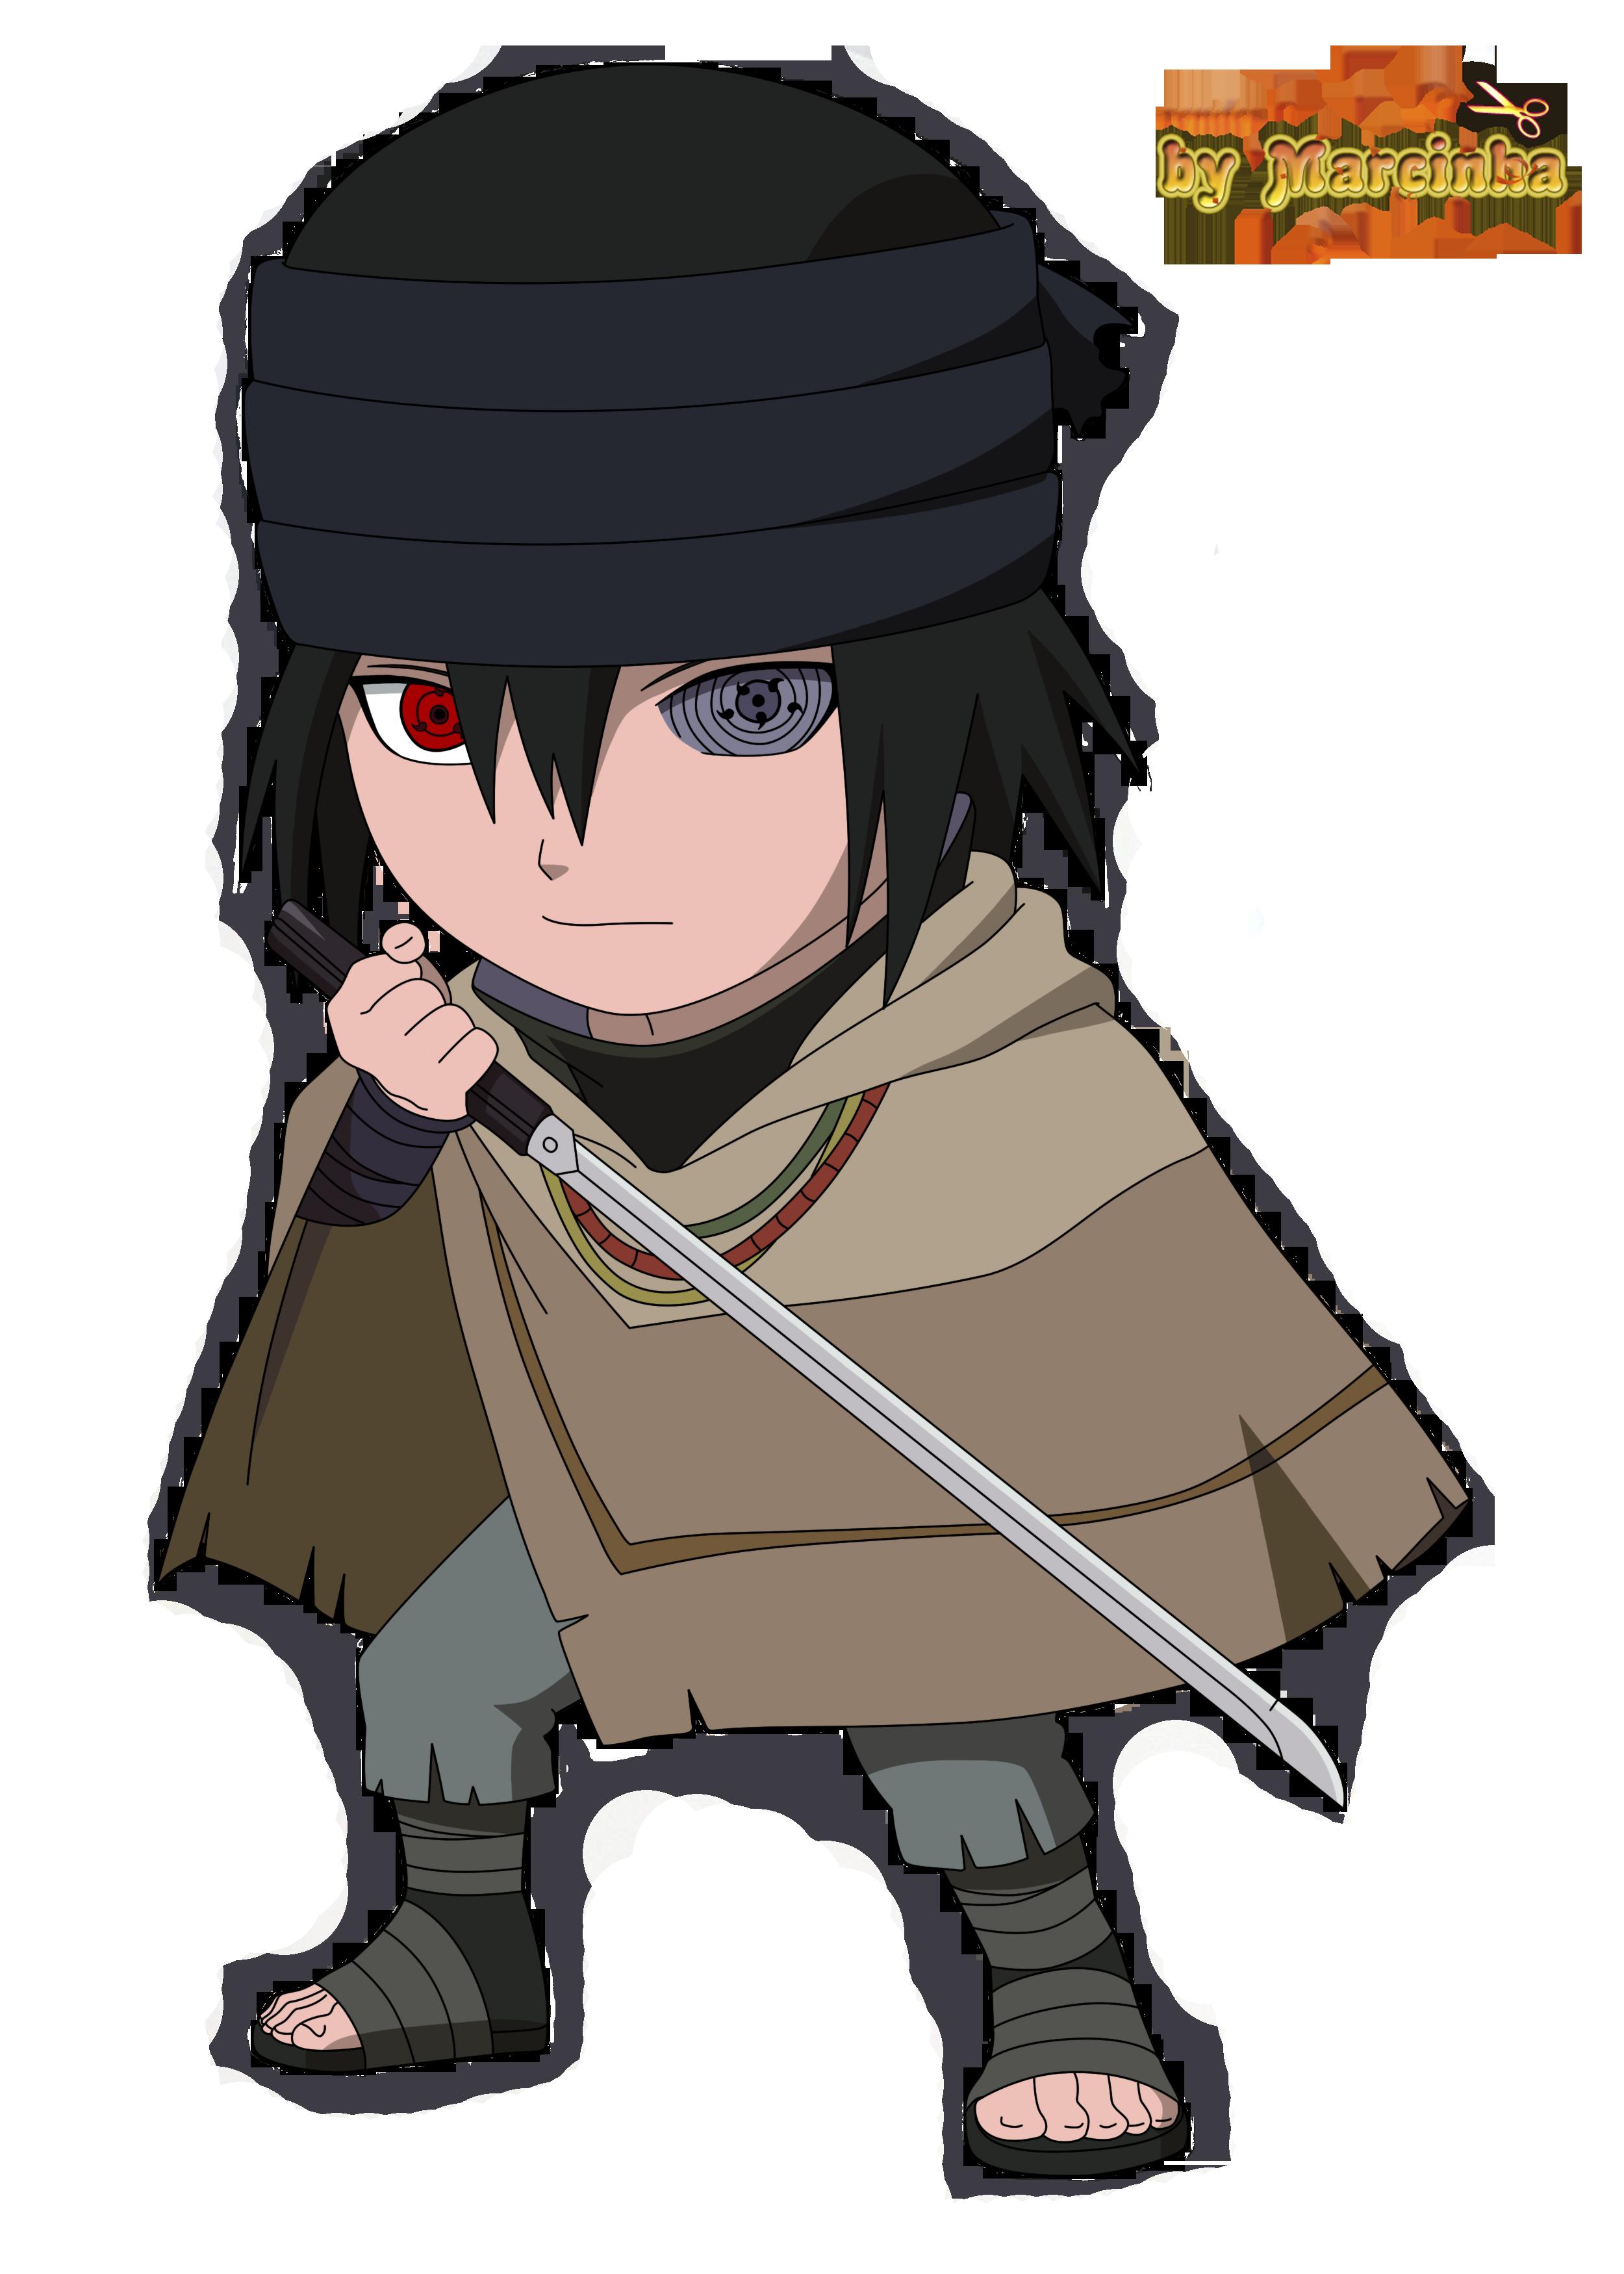 Chibi Sasuke The Last by Marcinha20 on DeviantArt